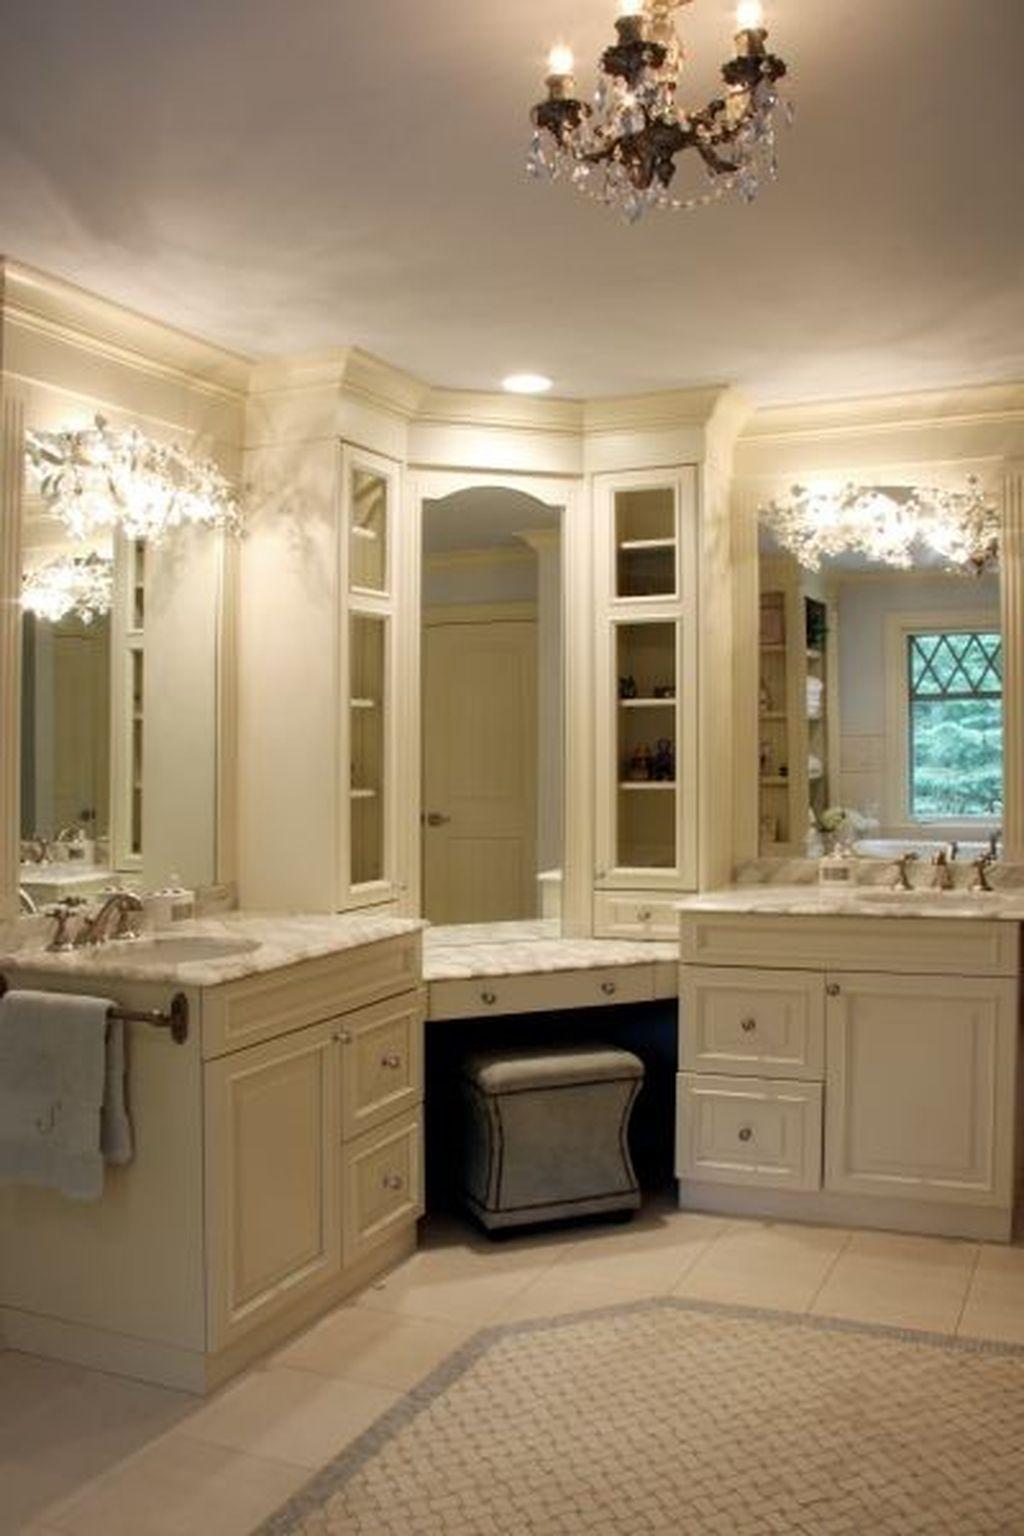 Romantic And Elegant Bathroom Design Ideas With Chandeliers 16